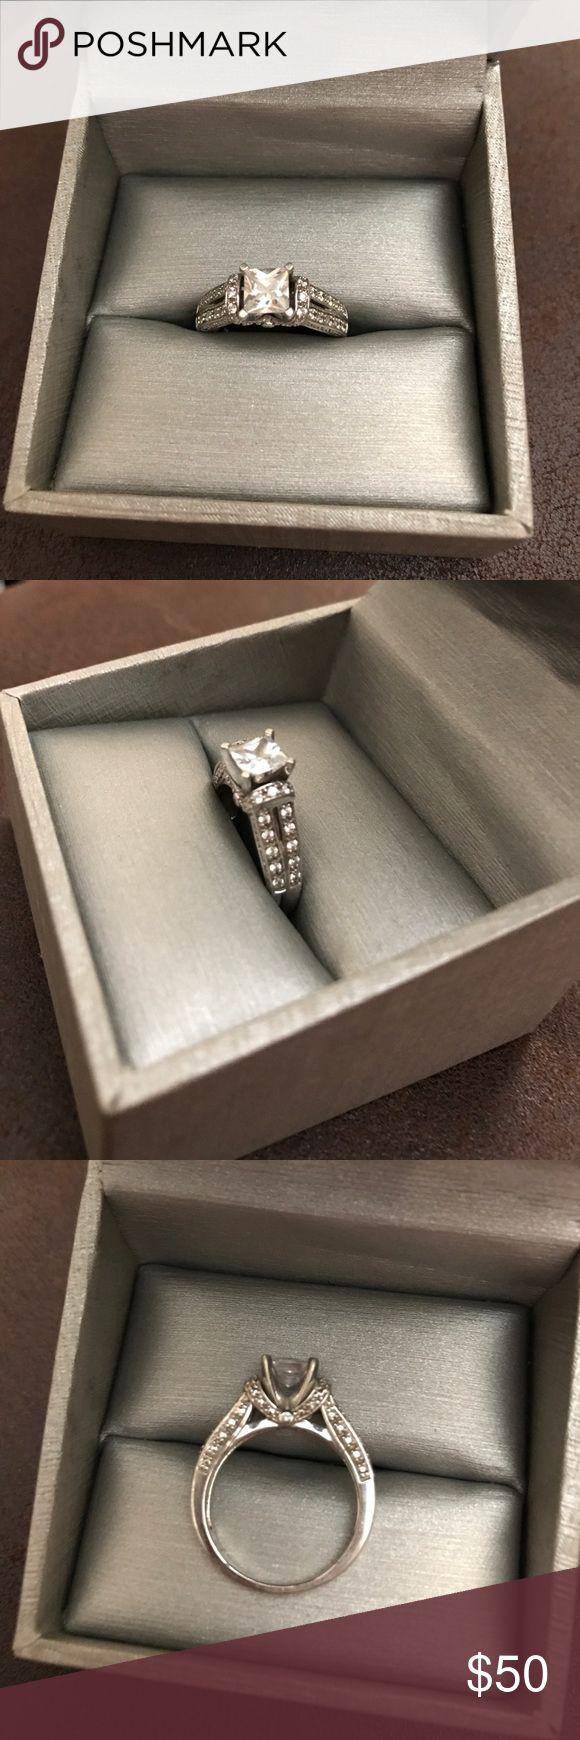 Cz Engagement Wedding Ring